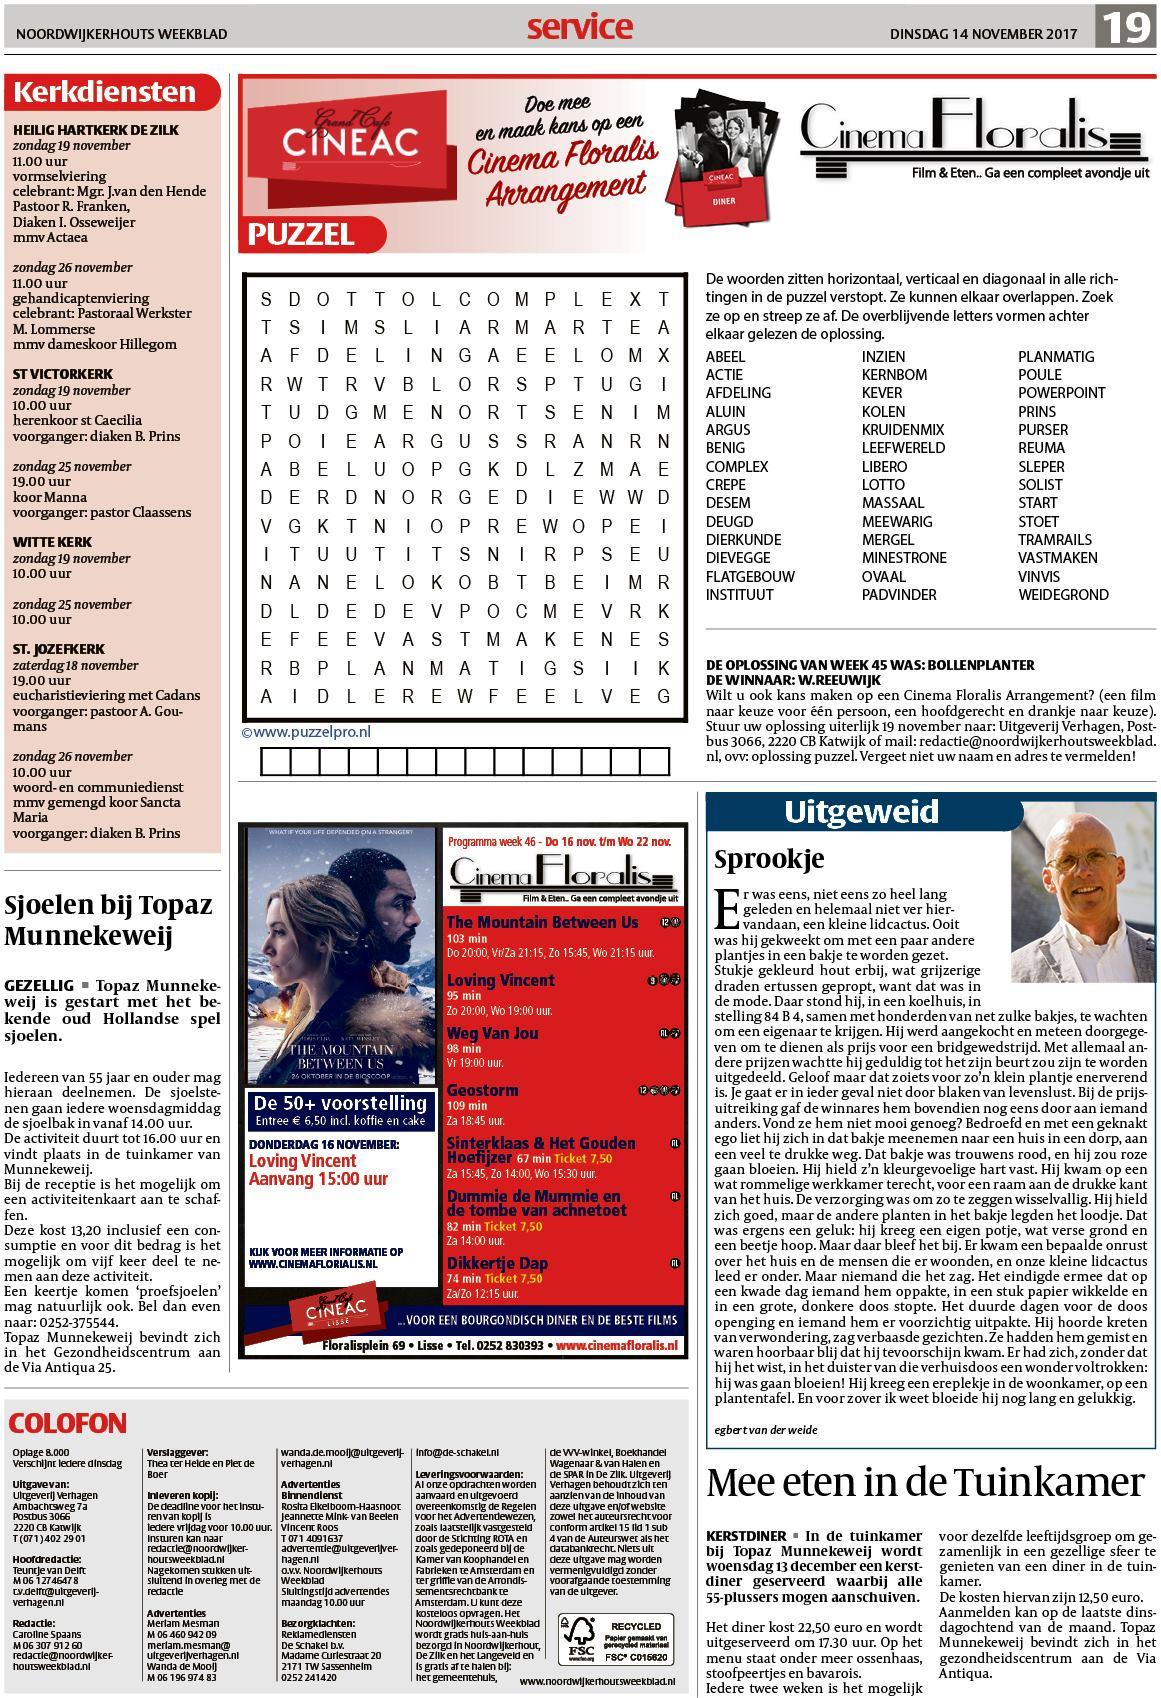 6916a9aad4a Noordwijkerhouts Weekblad 14 november 2017